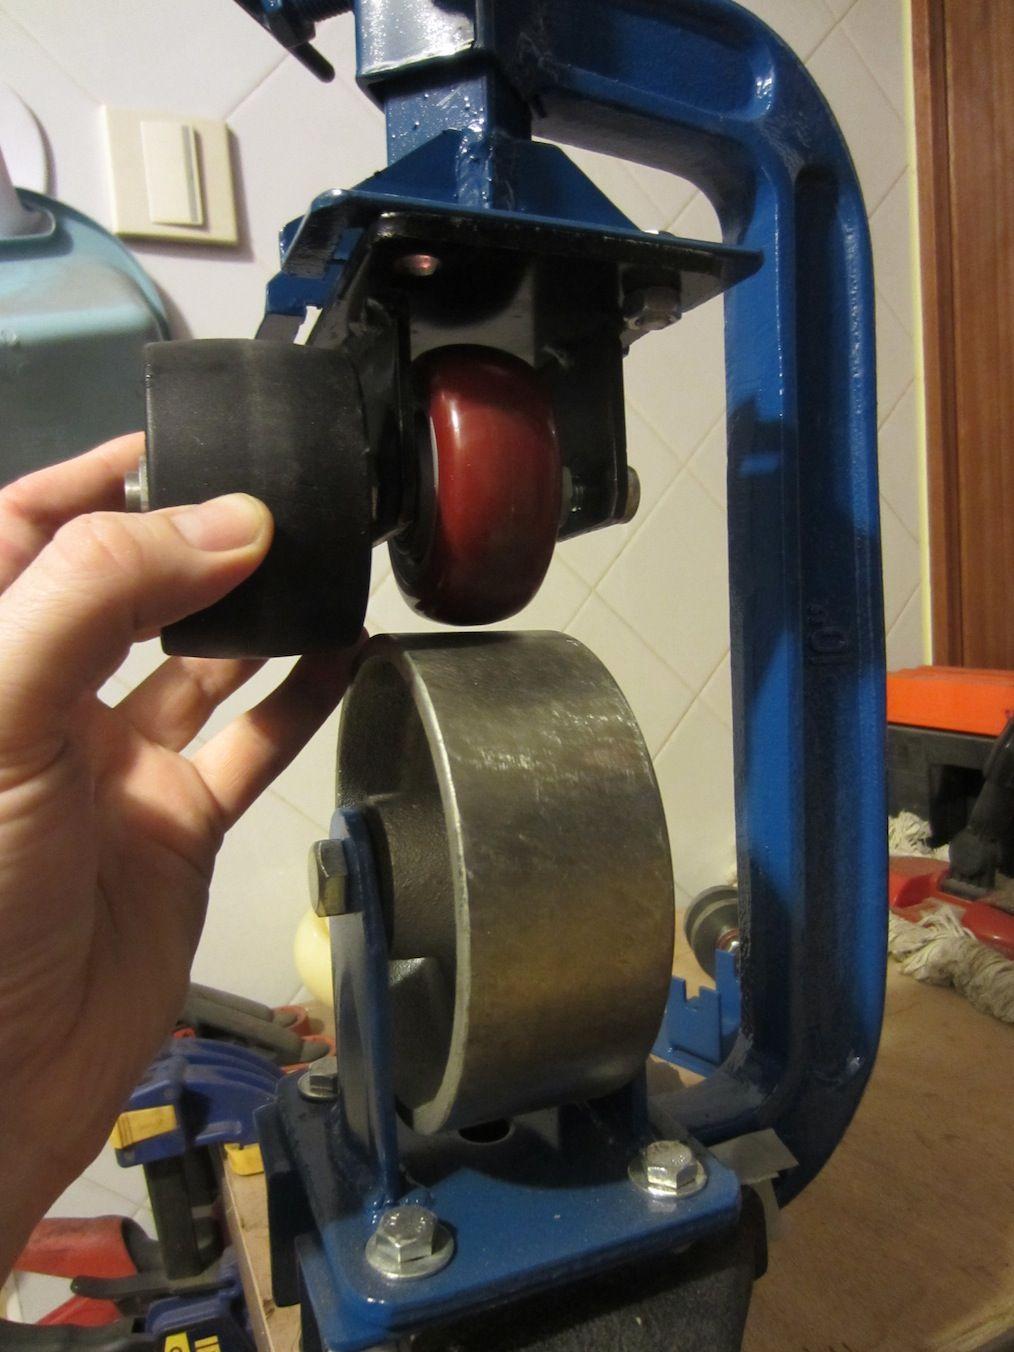 C Clamp English Wheel English Wheel Metal Fabrication Tools Metal Working Tools